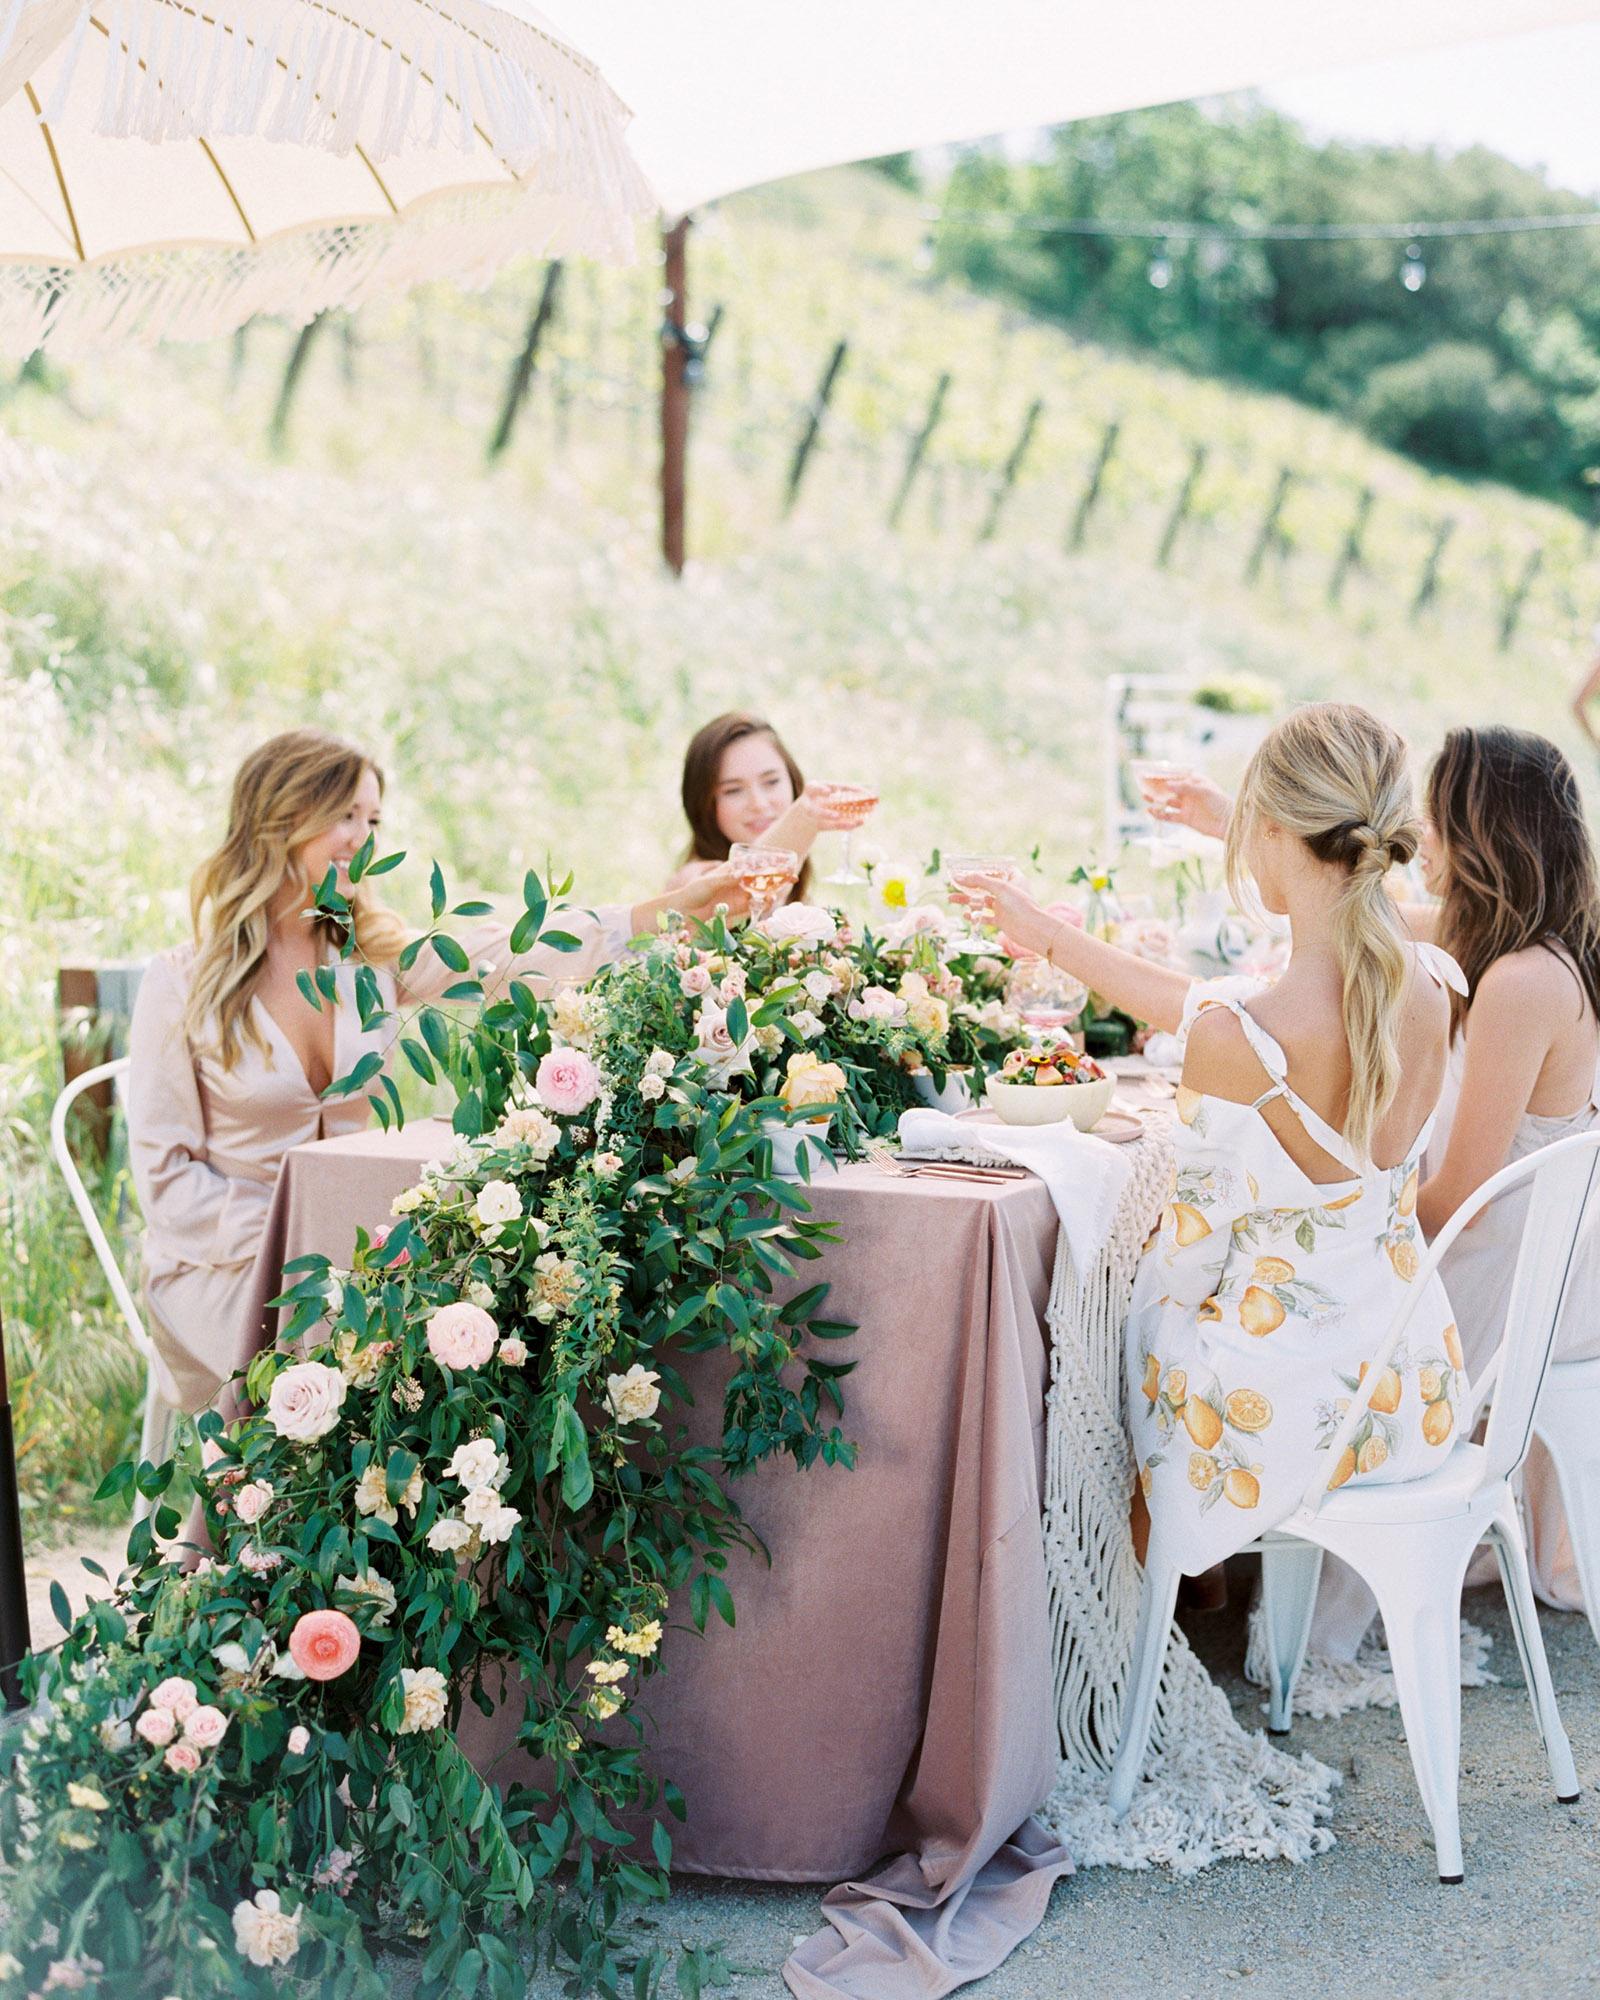 bachelorette party alternative at vineyard